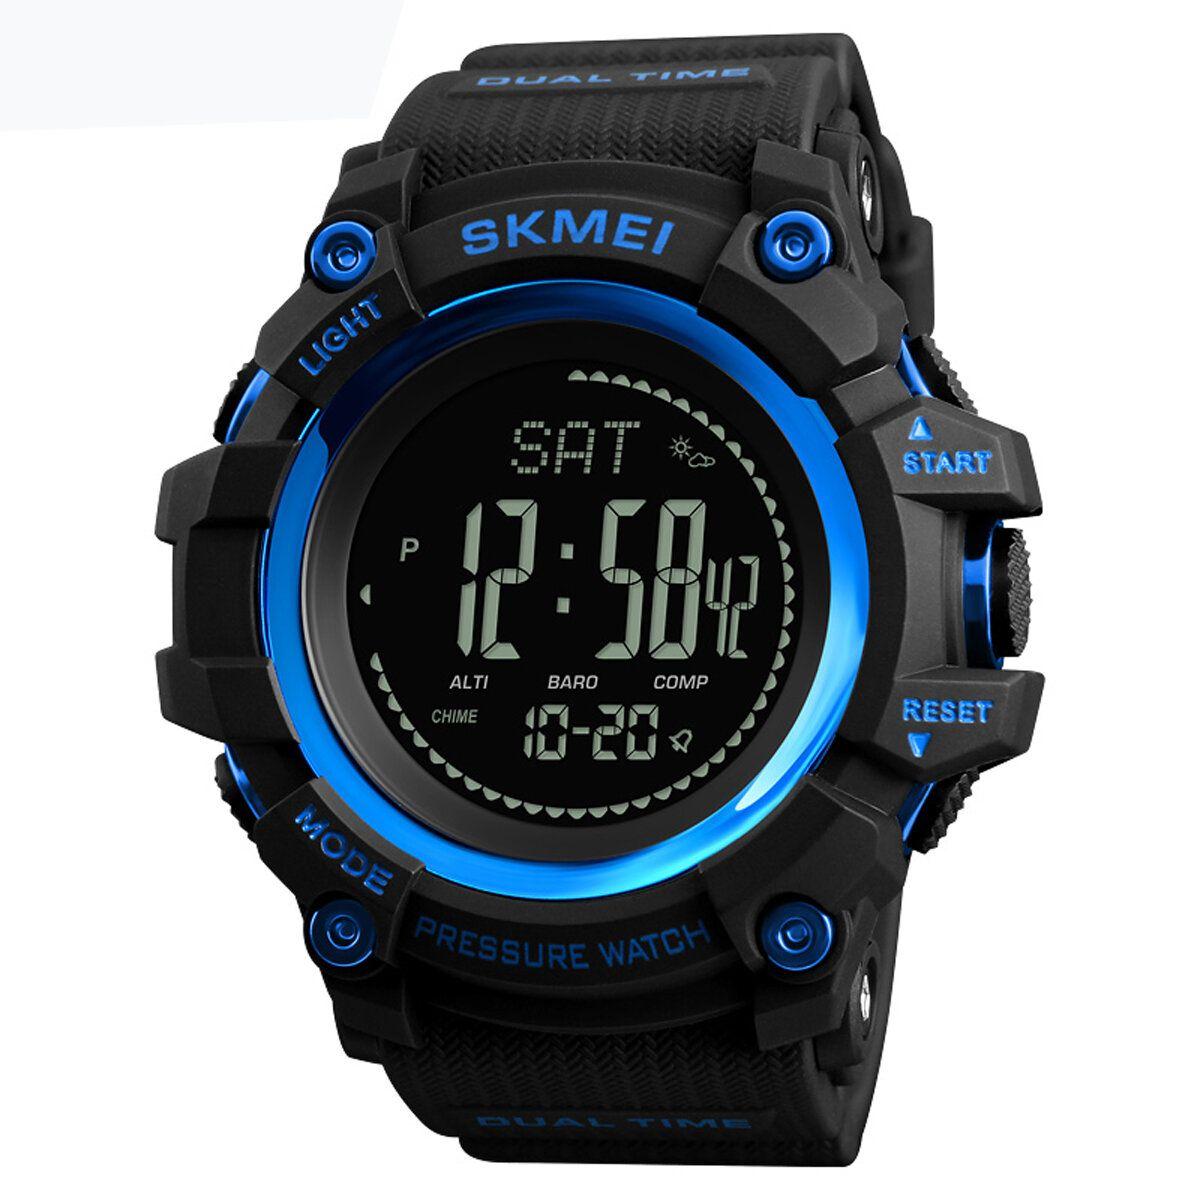 JNA US$17.49 SKMEI 1358 3ATM Waterproof Smart Watch Pedometer Barometer Thermometer Altimeter Compass Outdoor Climbing Smart Bracelet